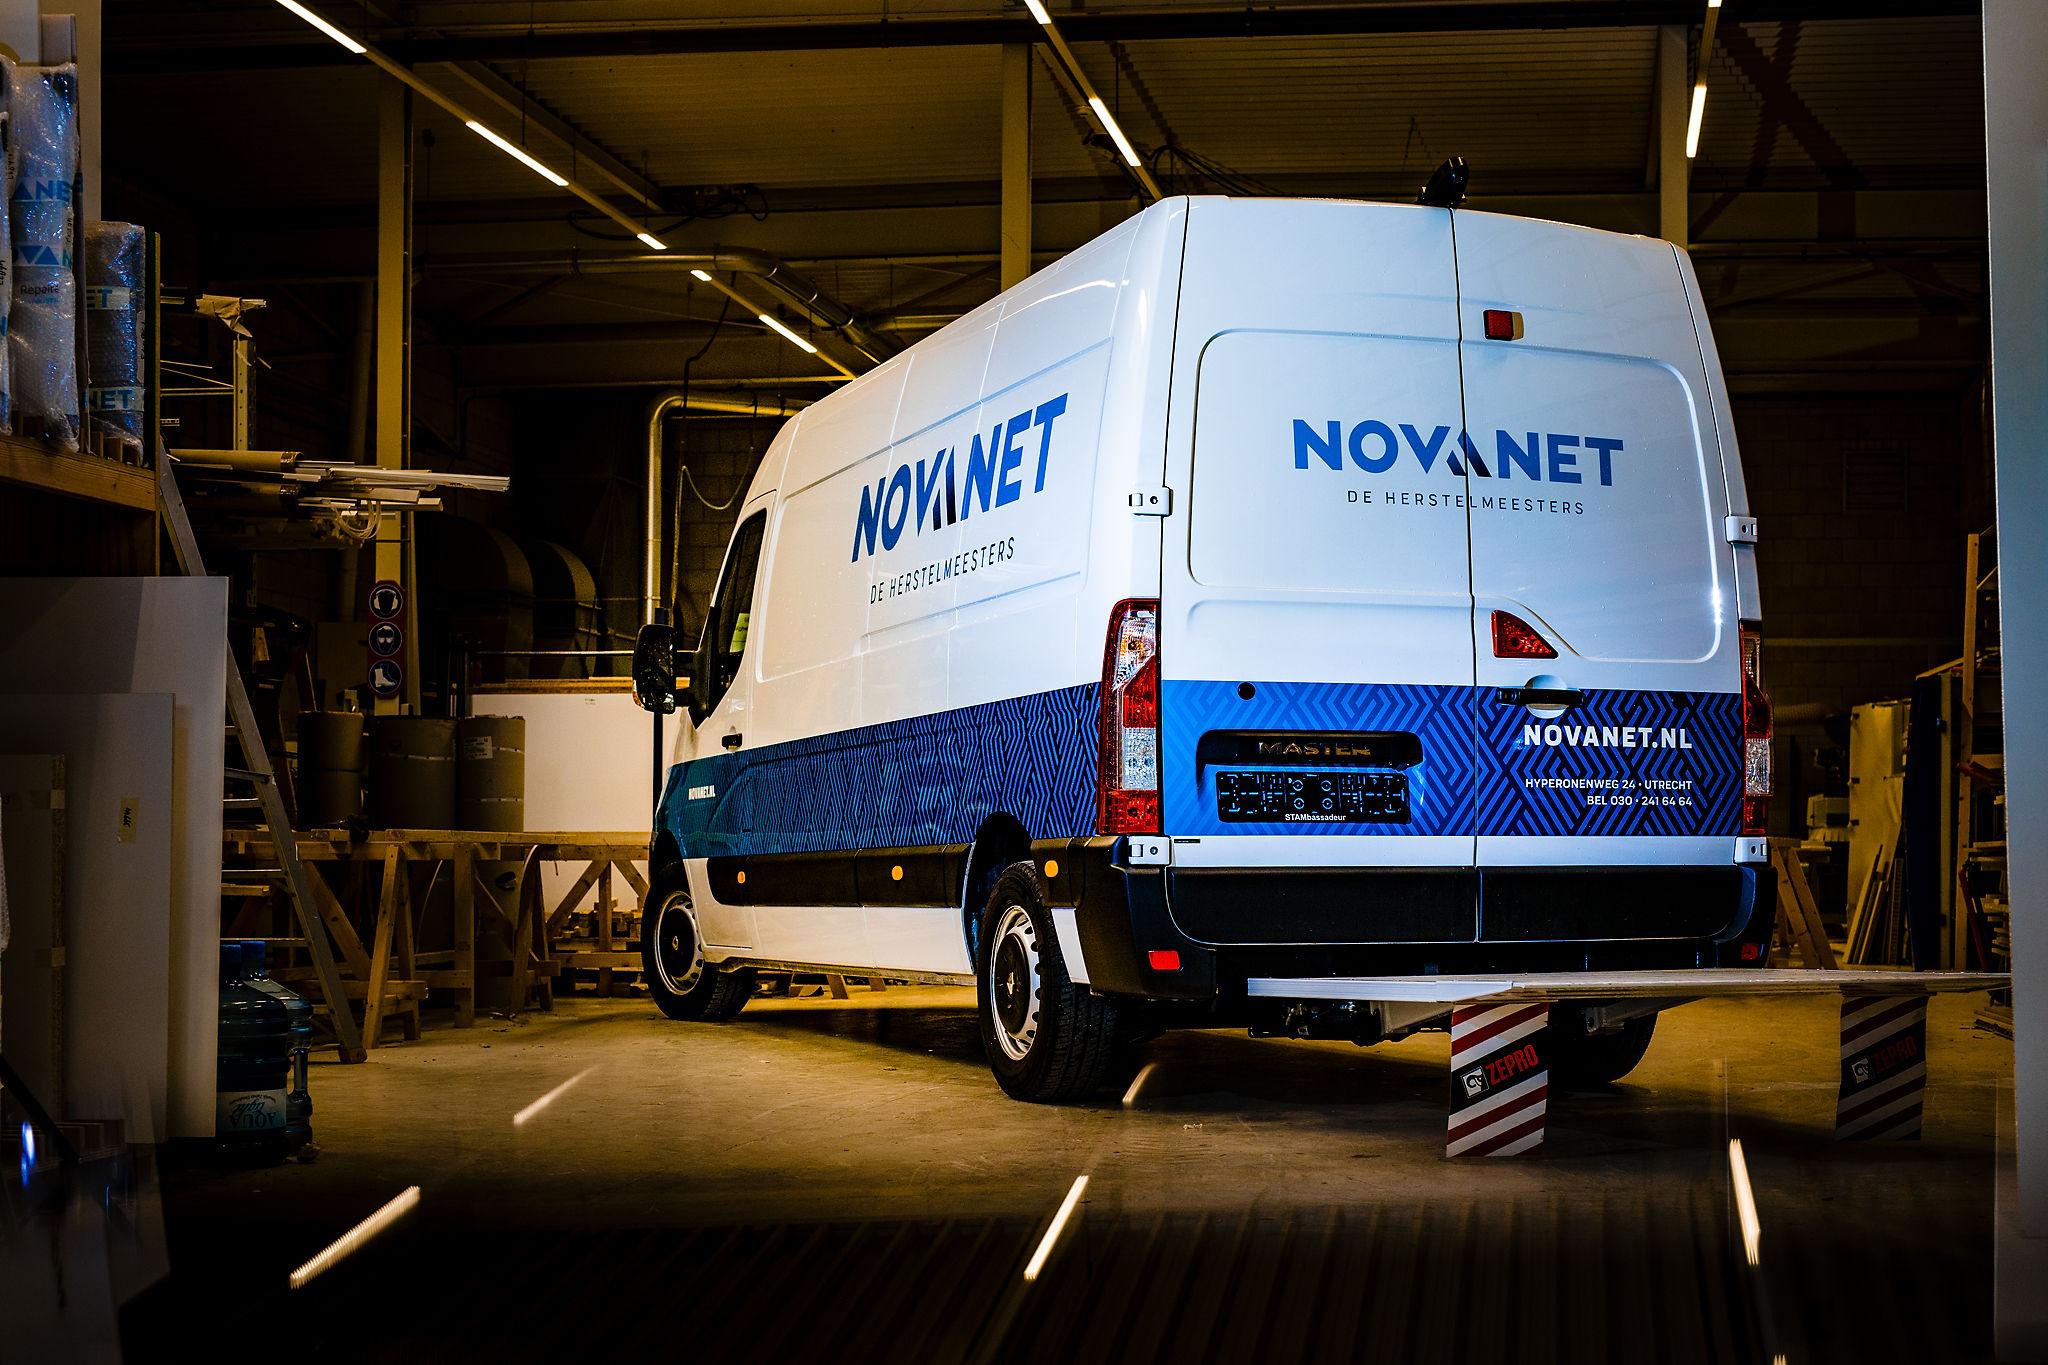 Novanet bus